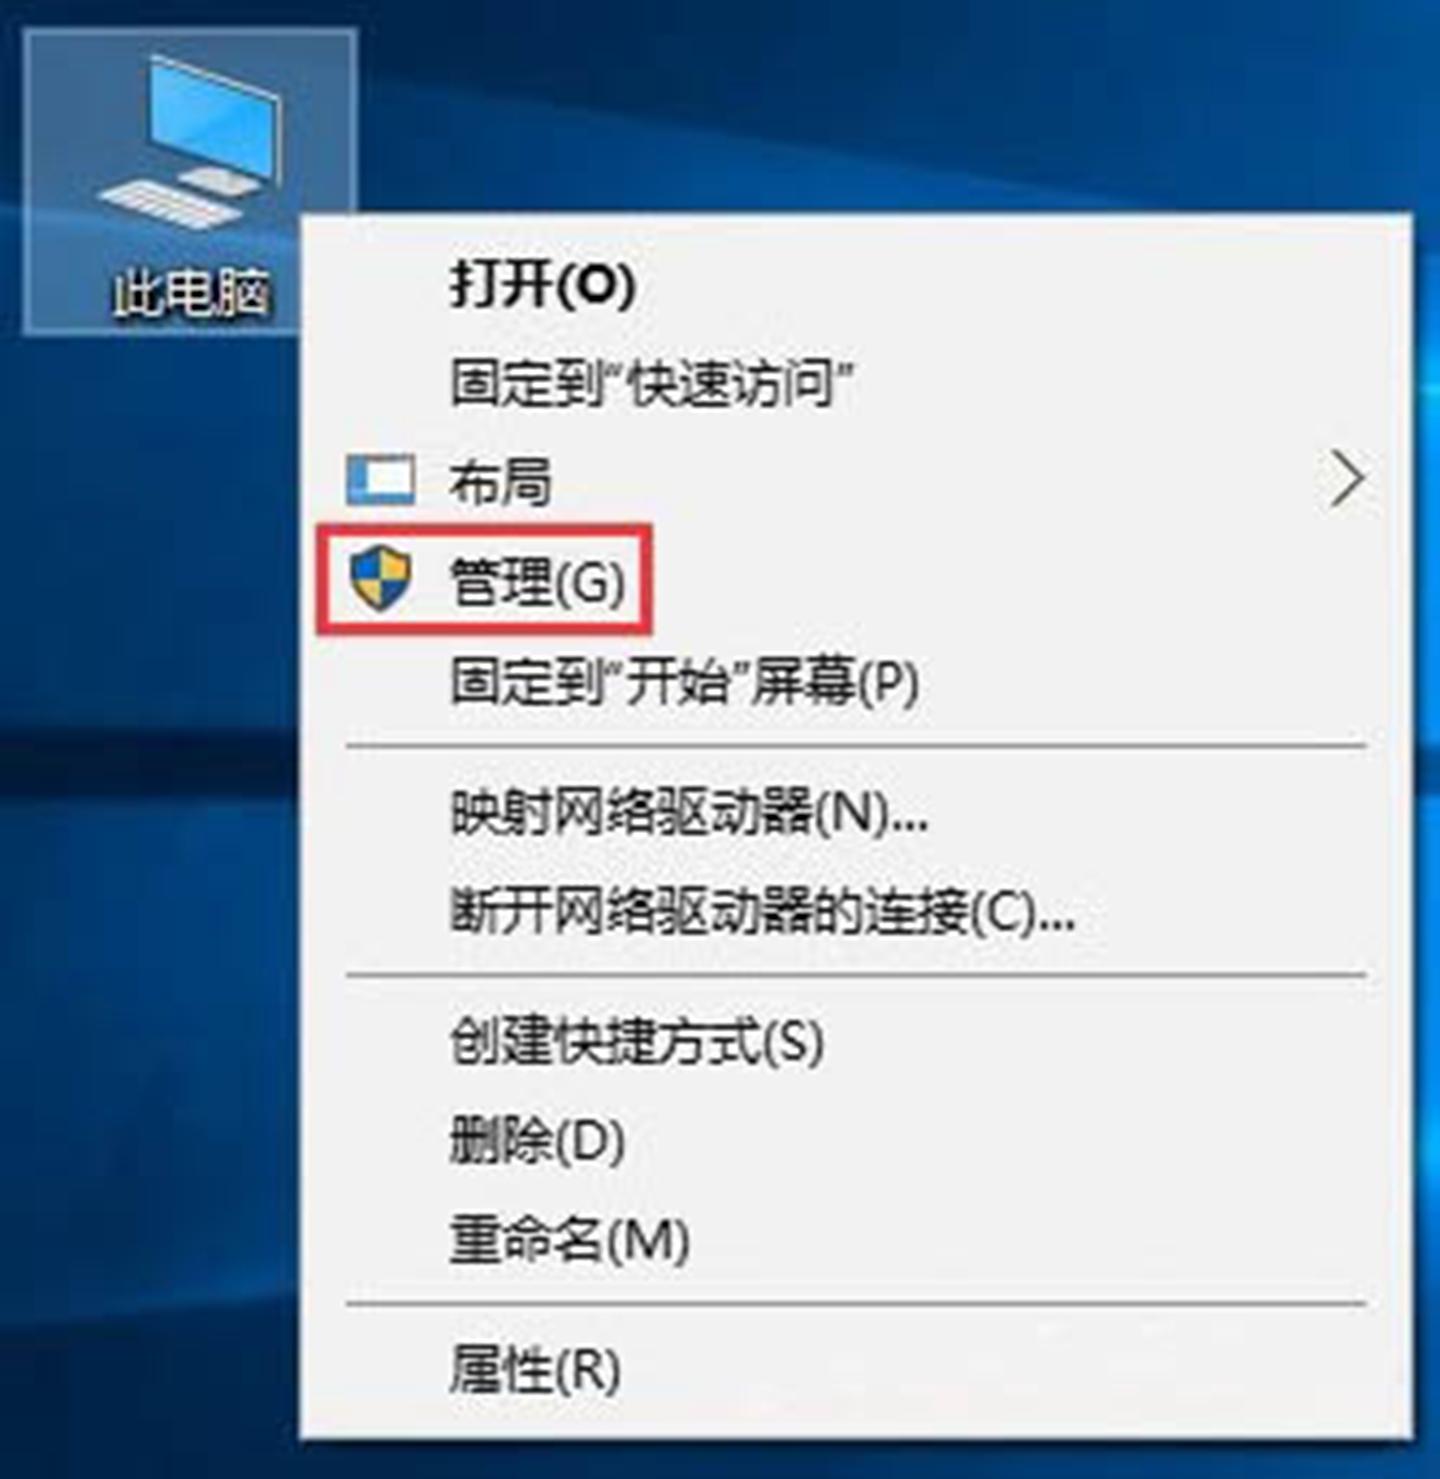 Win10电脑磁盘占用率100%的解决方法